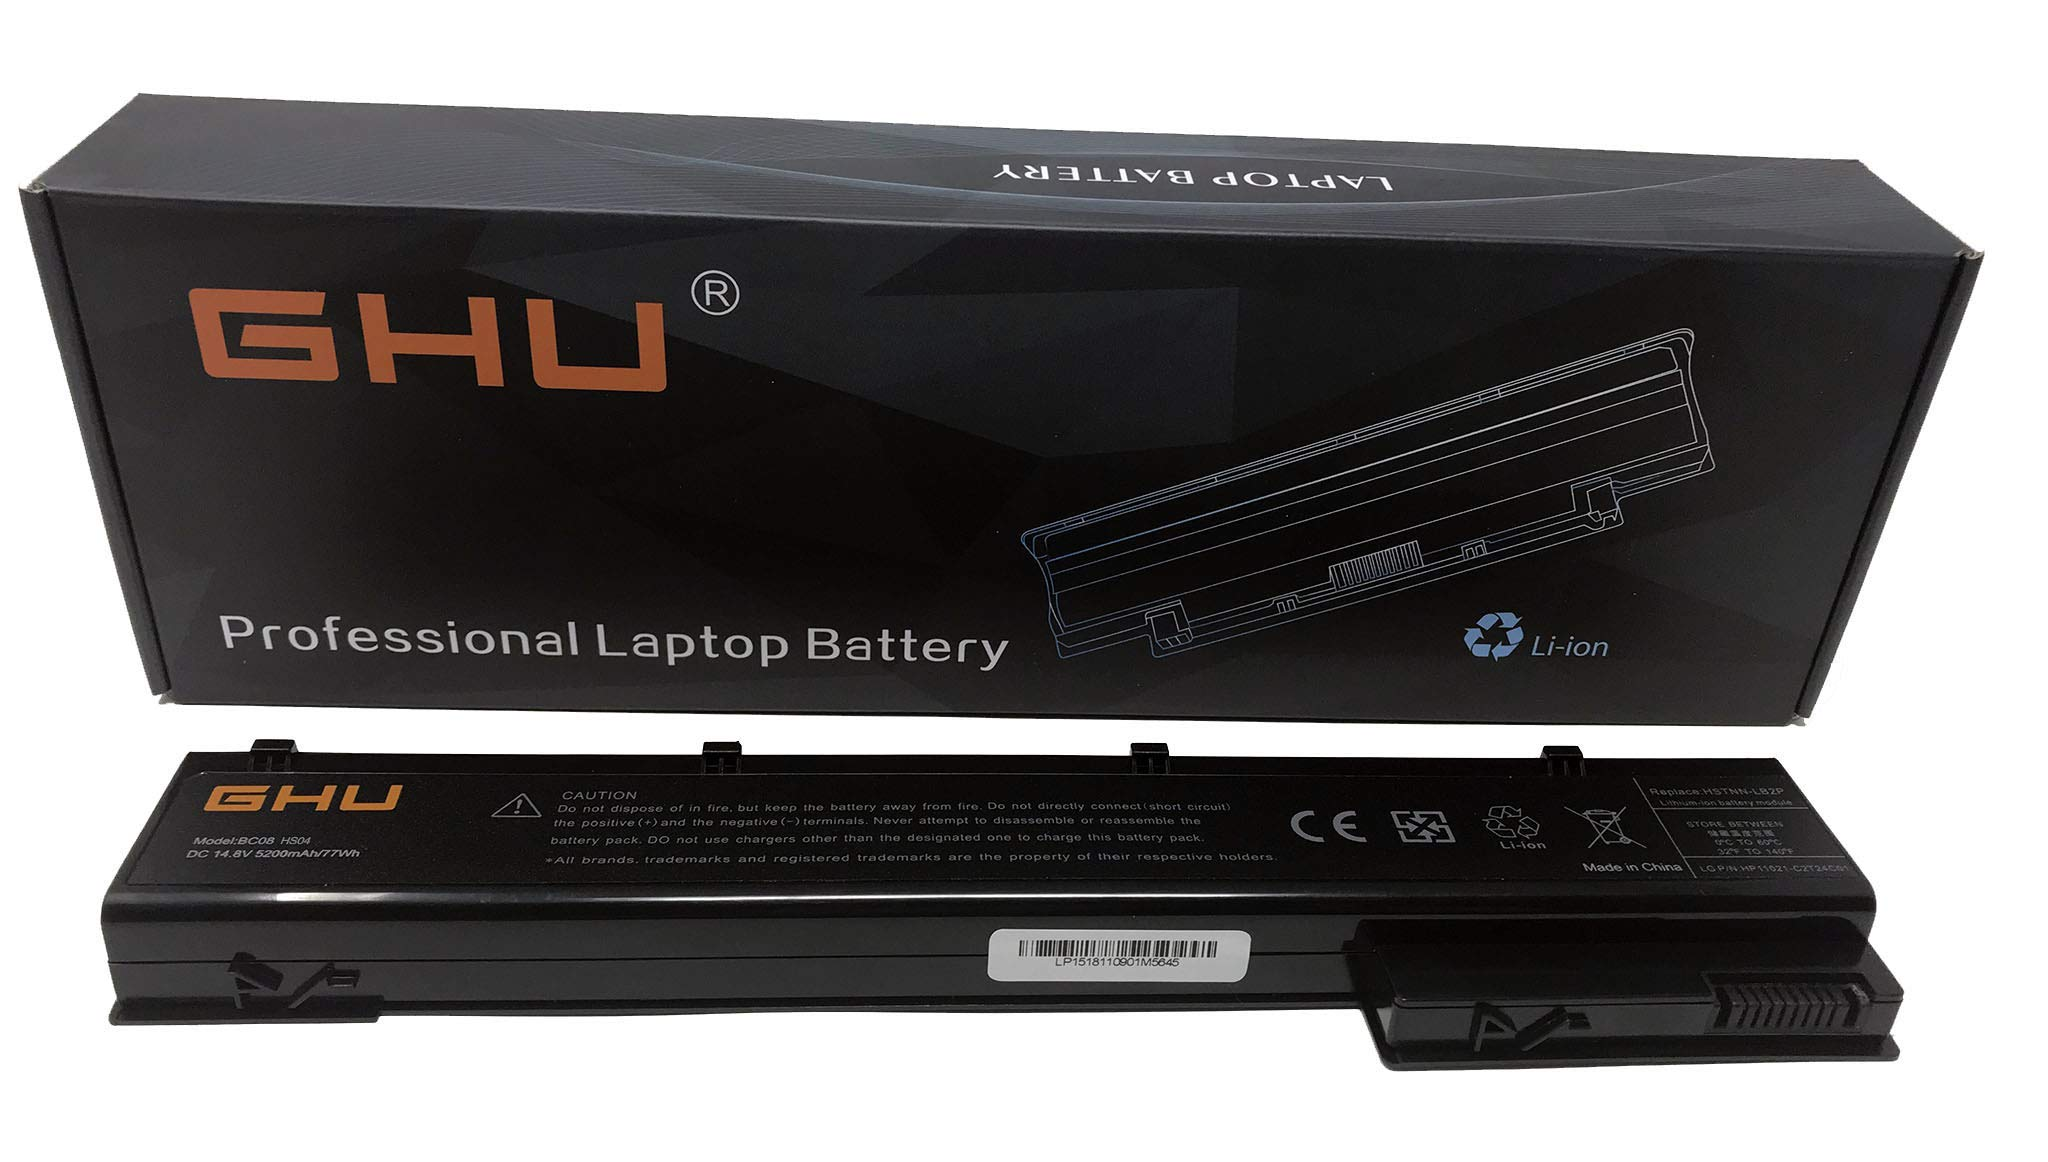 Bateria VH08 HP Elitebook 8560W 8570W 8760W 8770W Mobile Wor